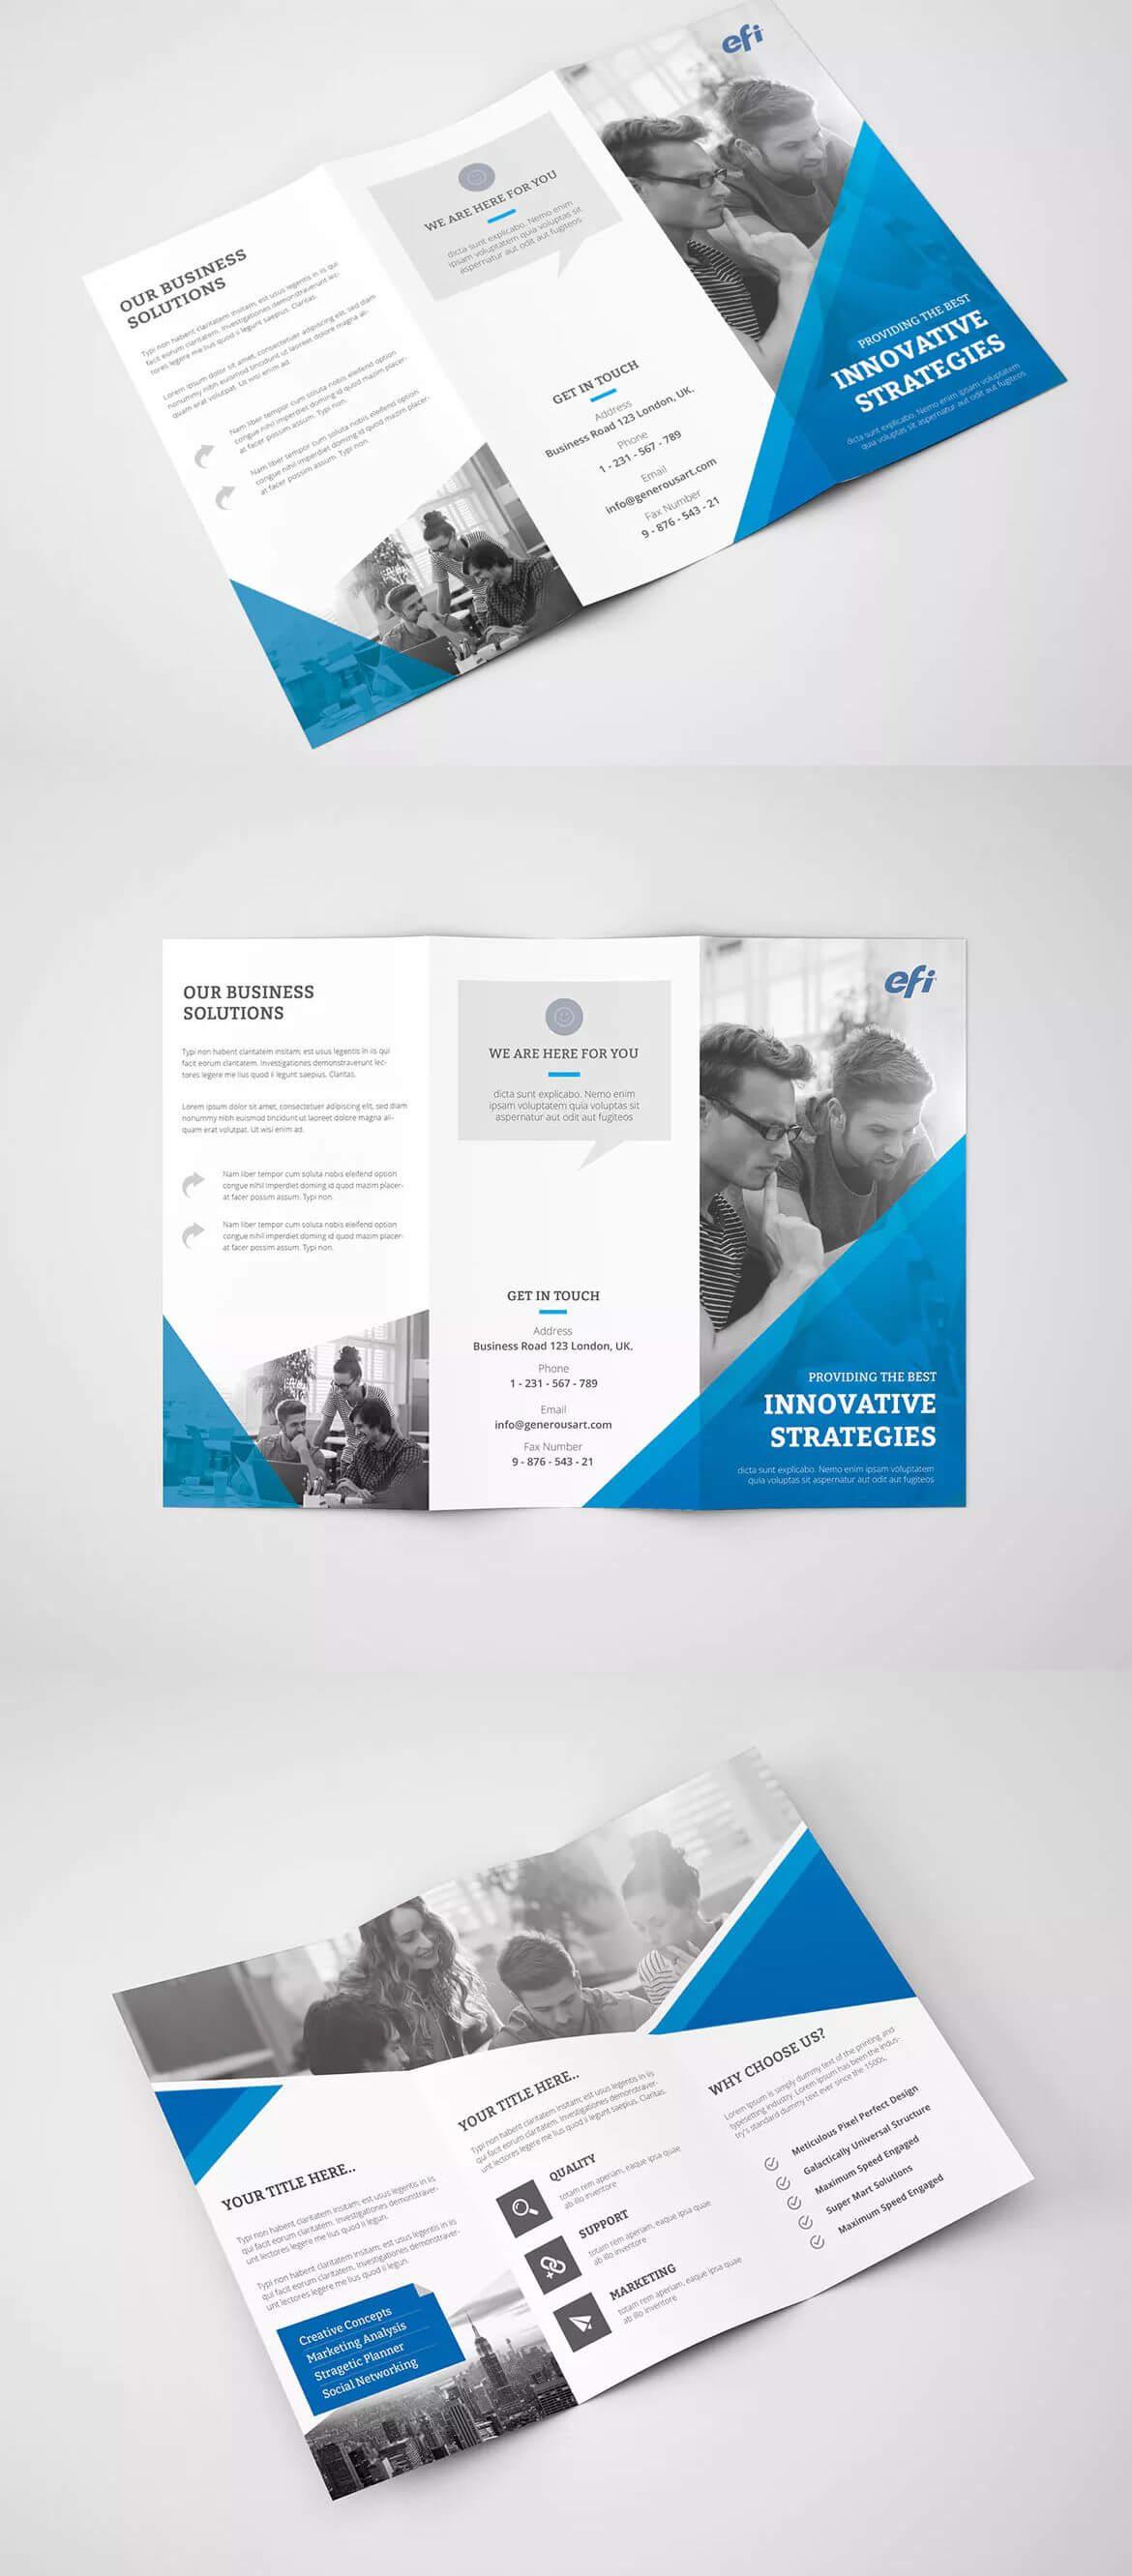 Trifold Brochure Template Psd - A4 | Brochure Design With Regard To Hotel Brochure Design Templates